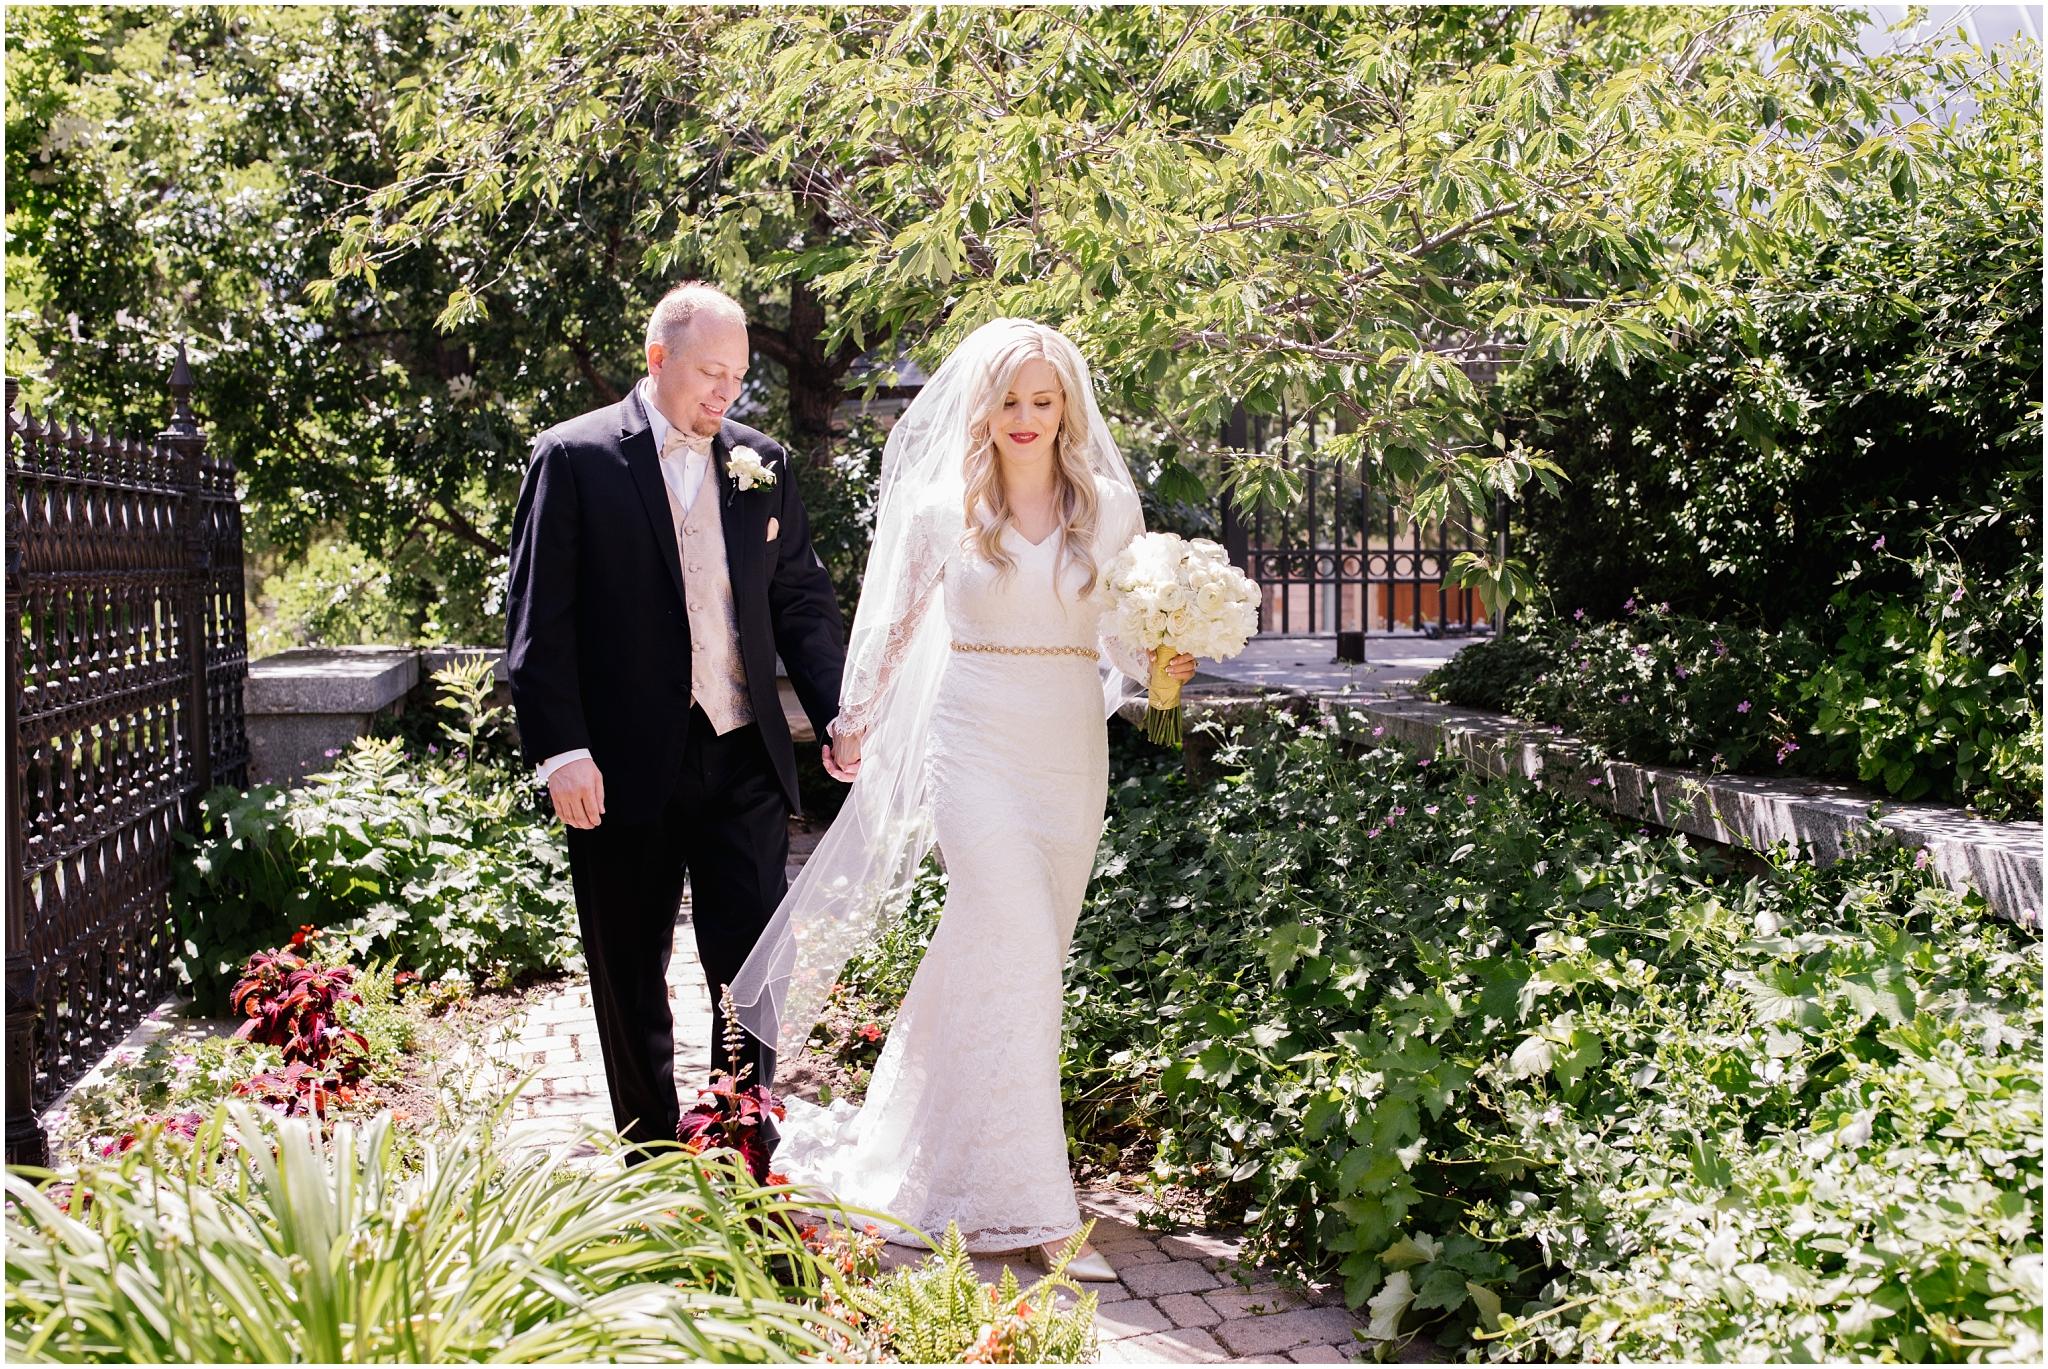 CherylandTyler-213_Lizzie-B-Imagery-Utah-Wedding-Photographer-Salt-Lake-City-Temple-Wells-Fargo-Building-Reception.jpg